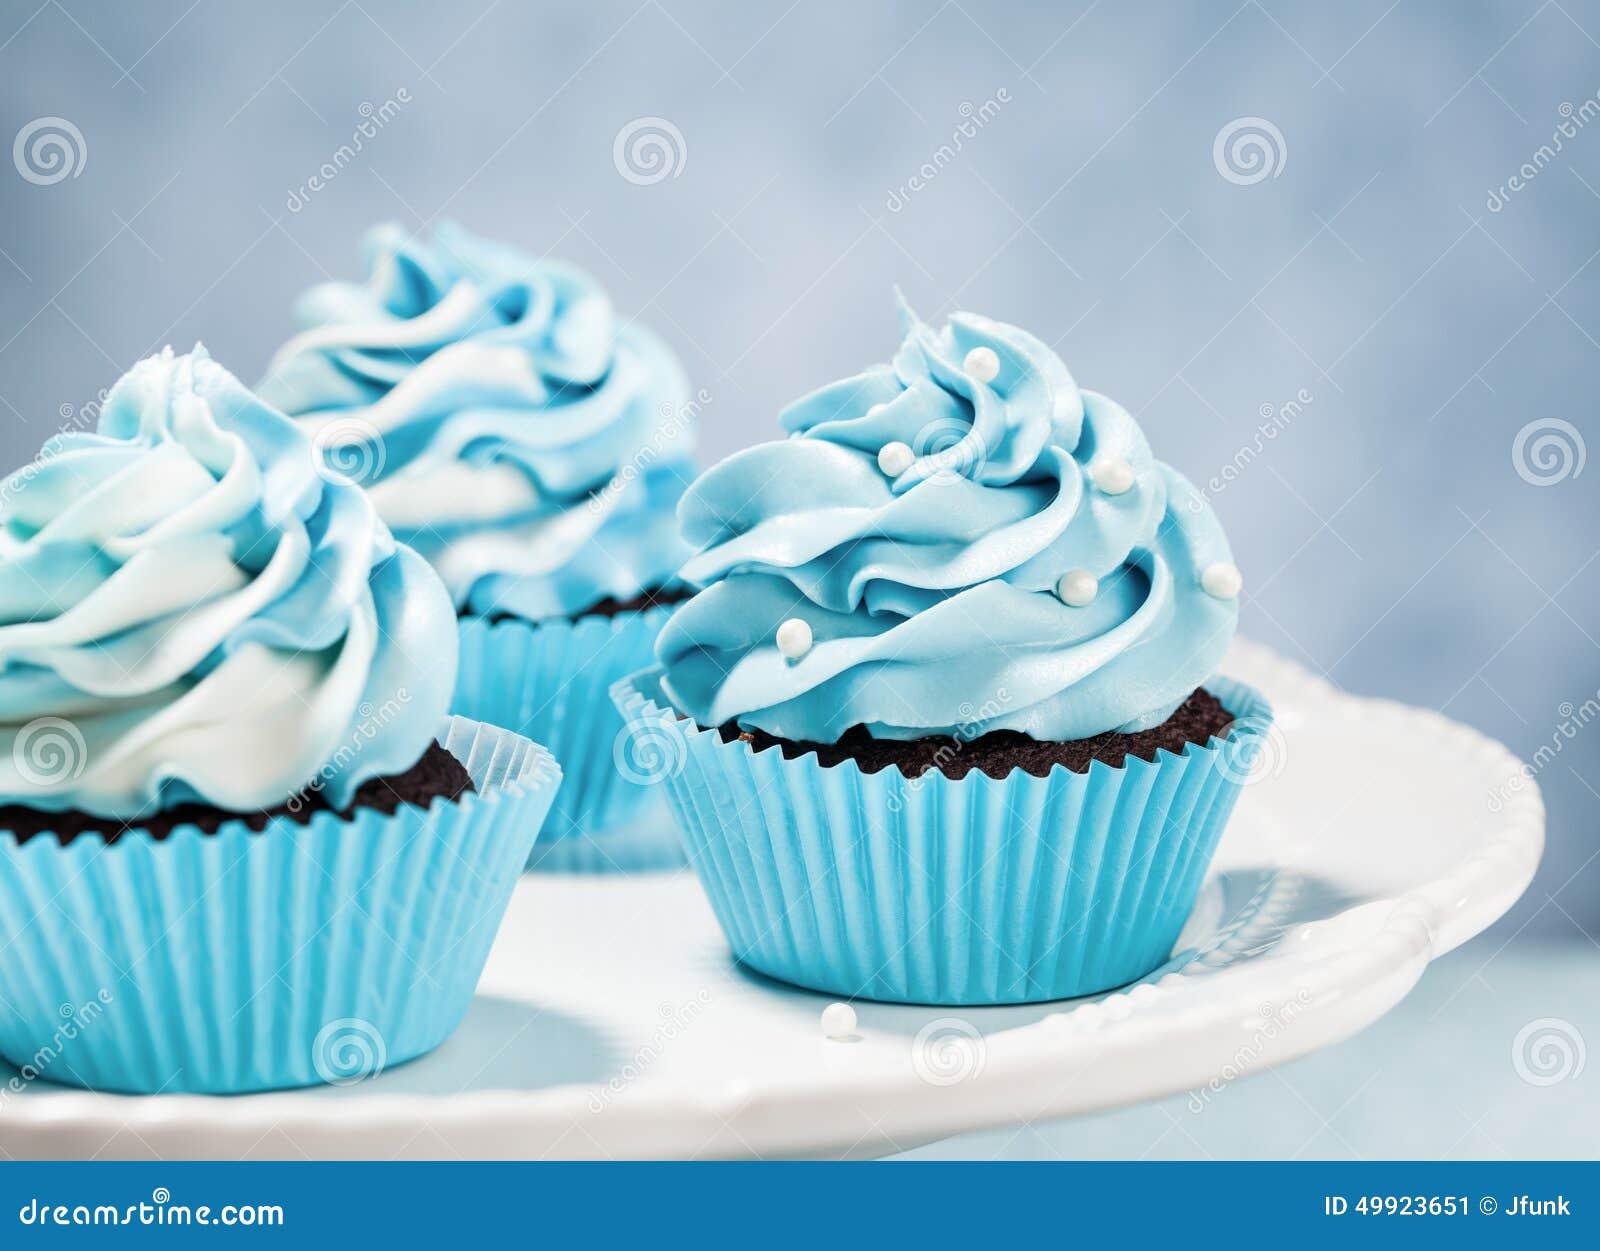 Blue Cupcake Images : Blue Cupcakes Stock Photo - Image: 49923651